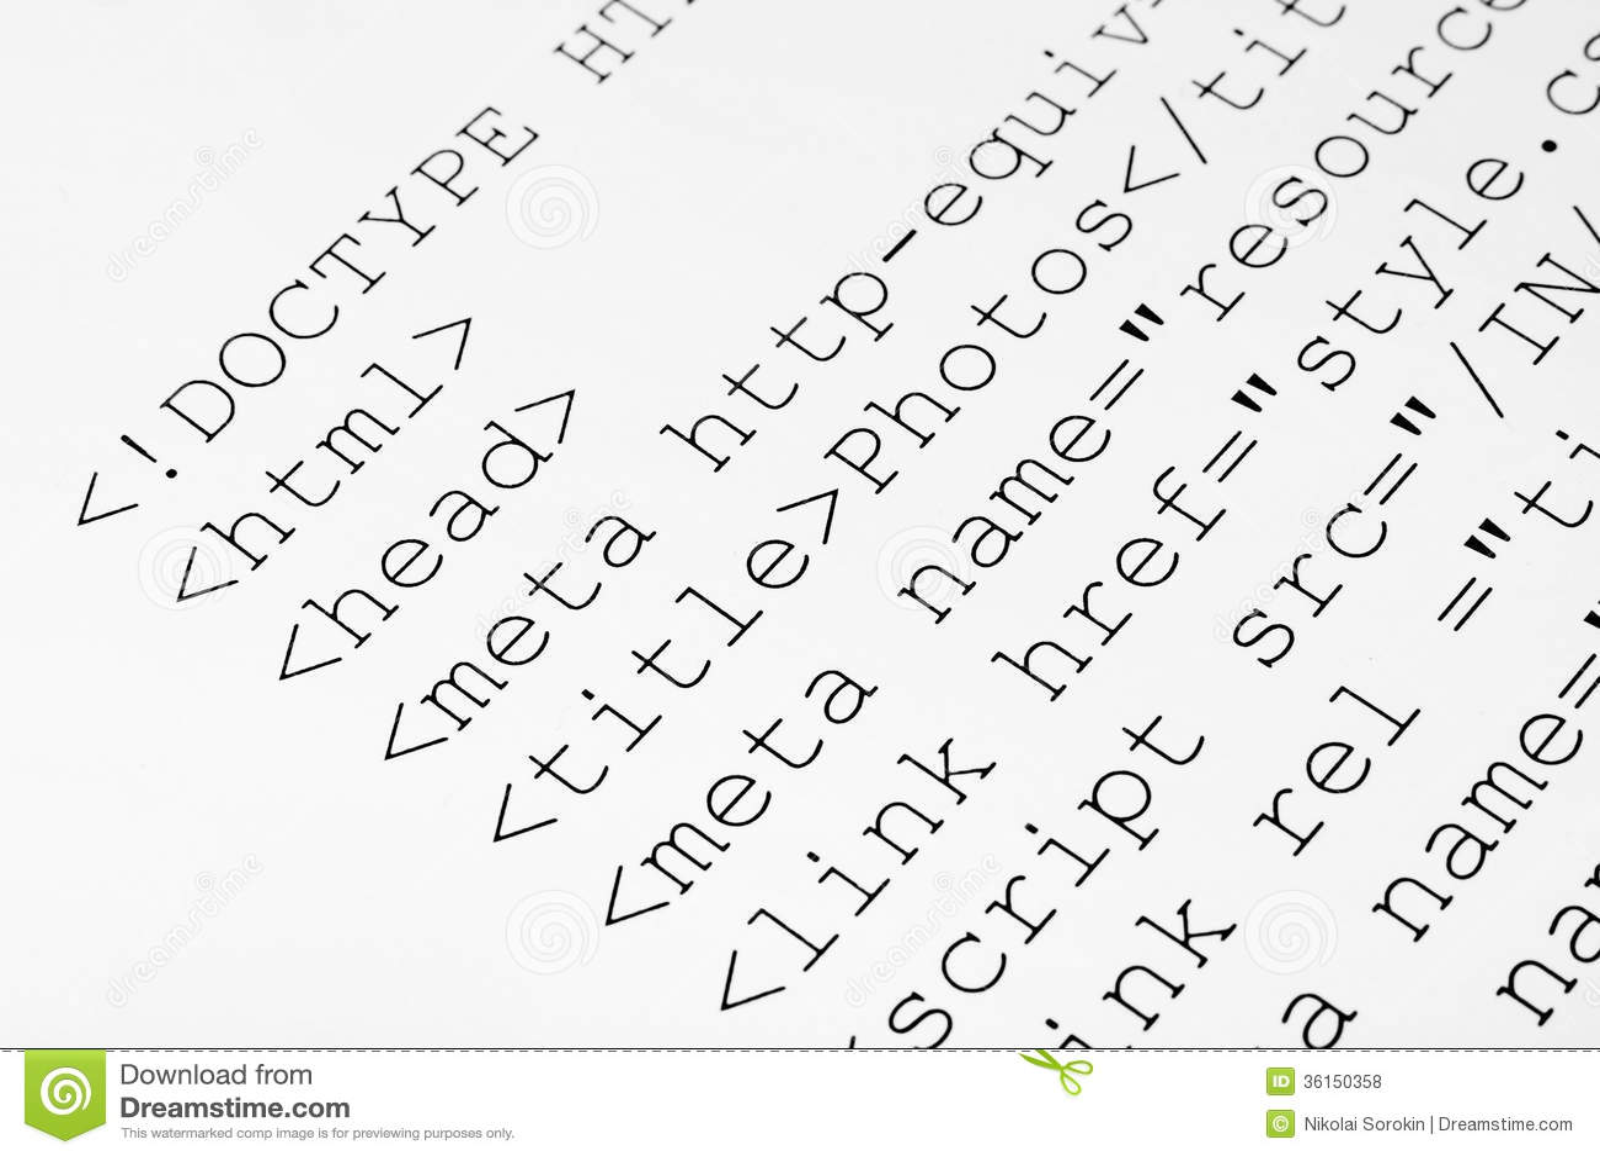 Printed Internet Html Code Royalty Free Stock Photos - Image: 36150358